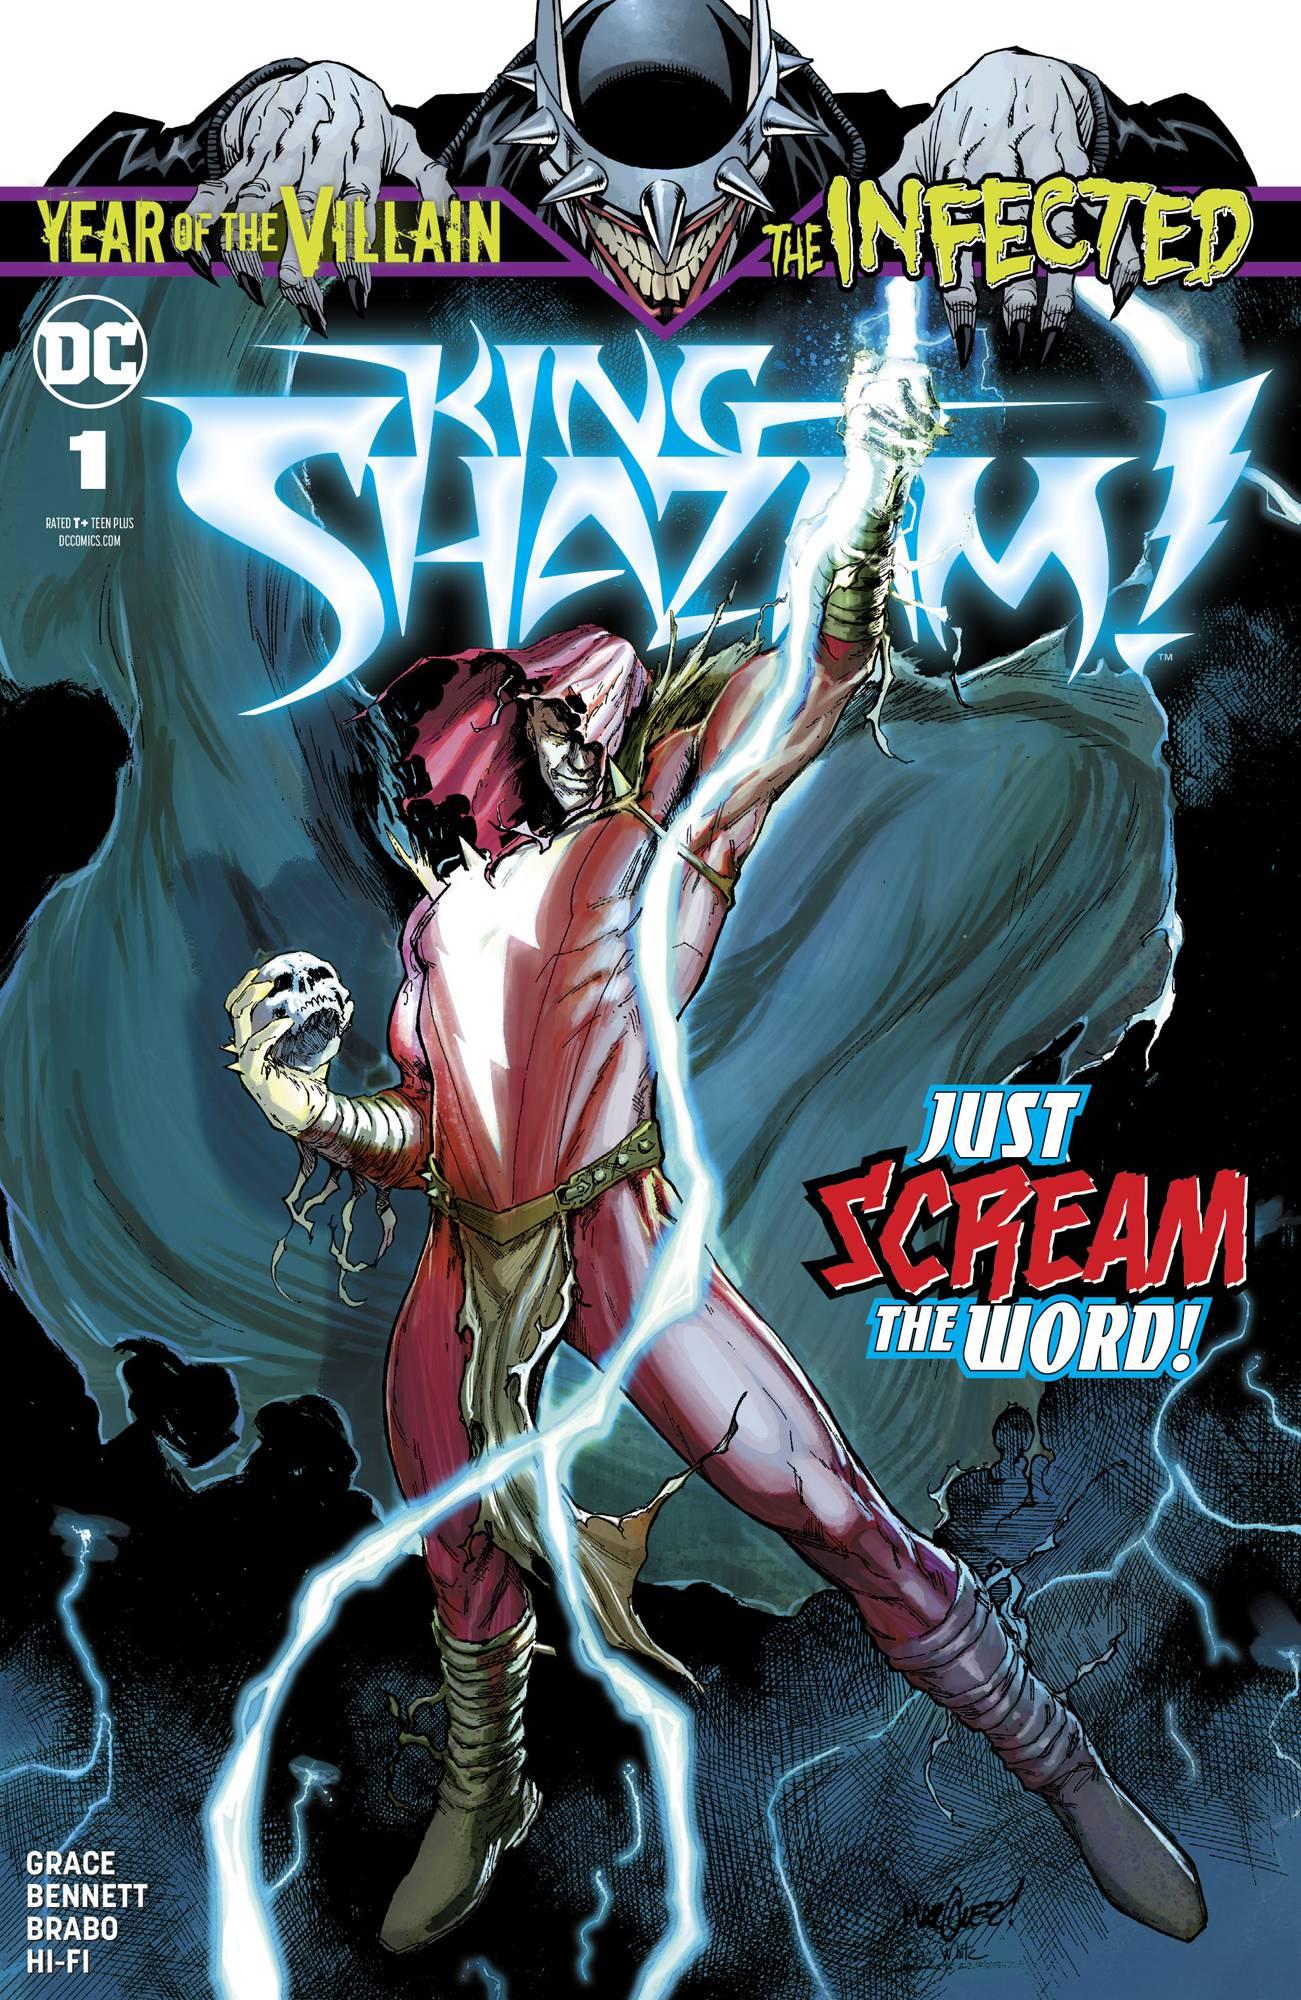 The Infected: King Shazam #1 (2019)